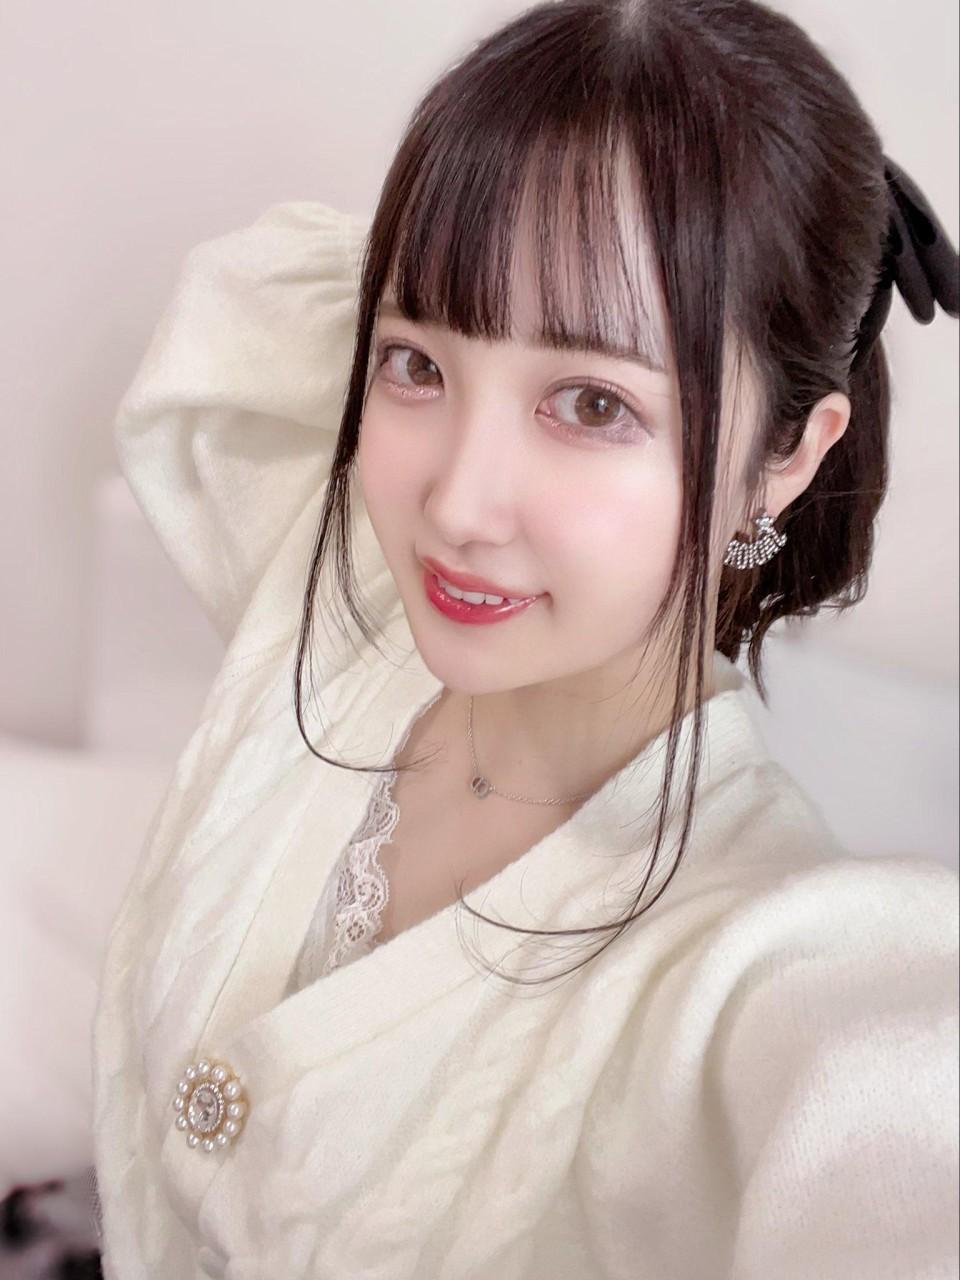 SOD史上年龄最小的女演员:朝田ひまり 2002年出生插图4